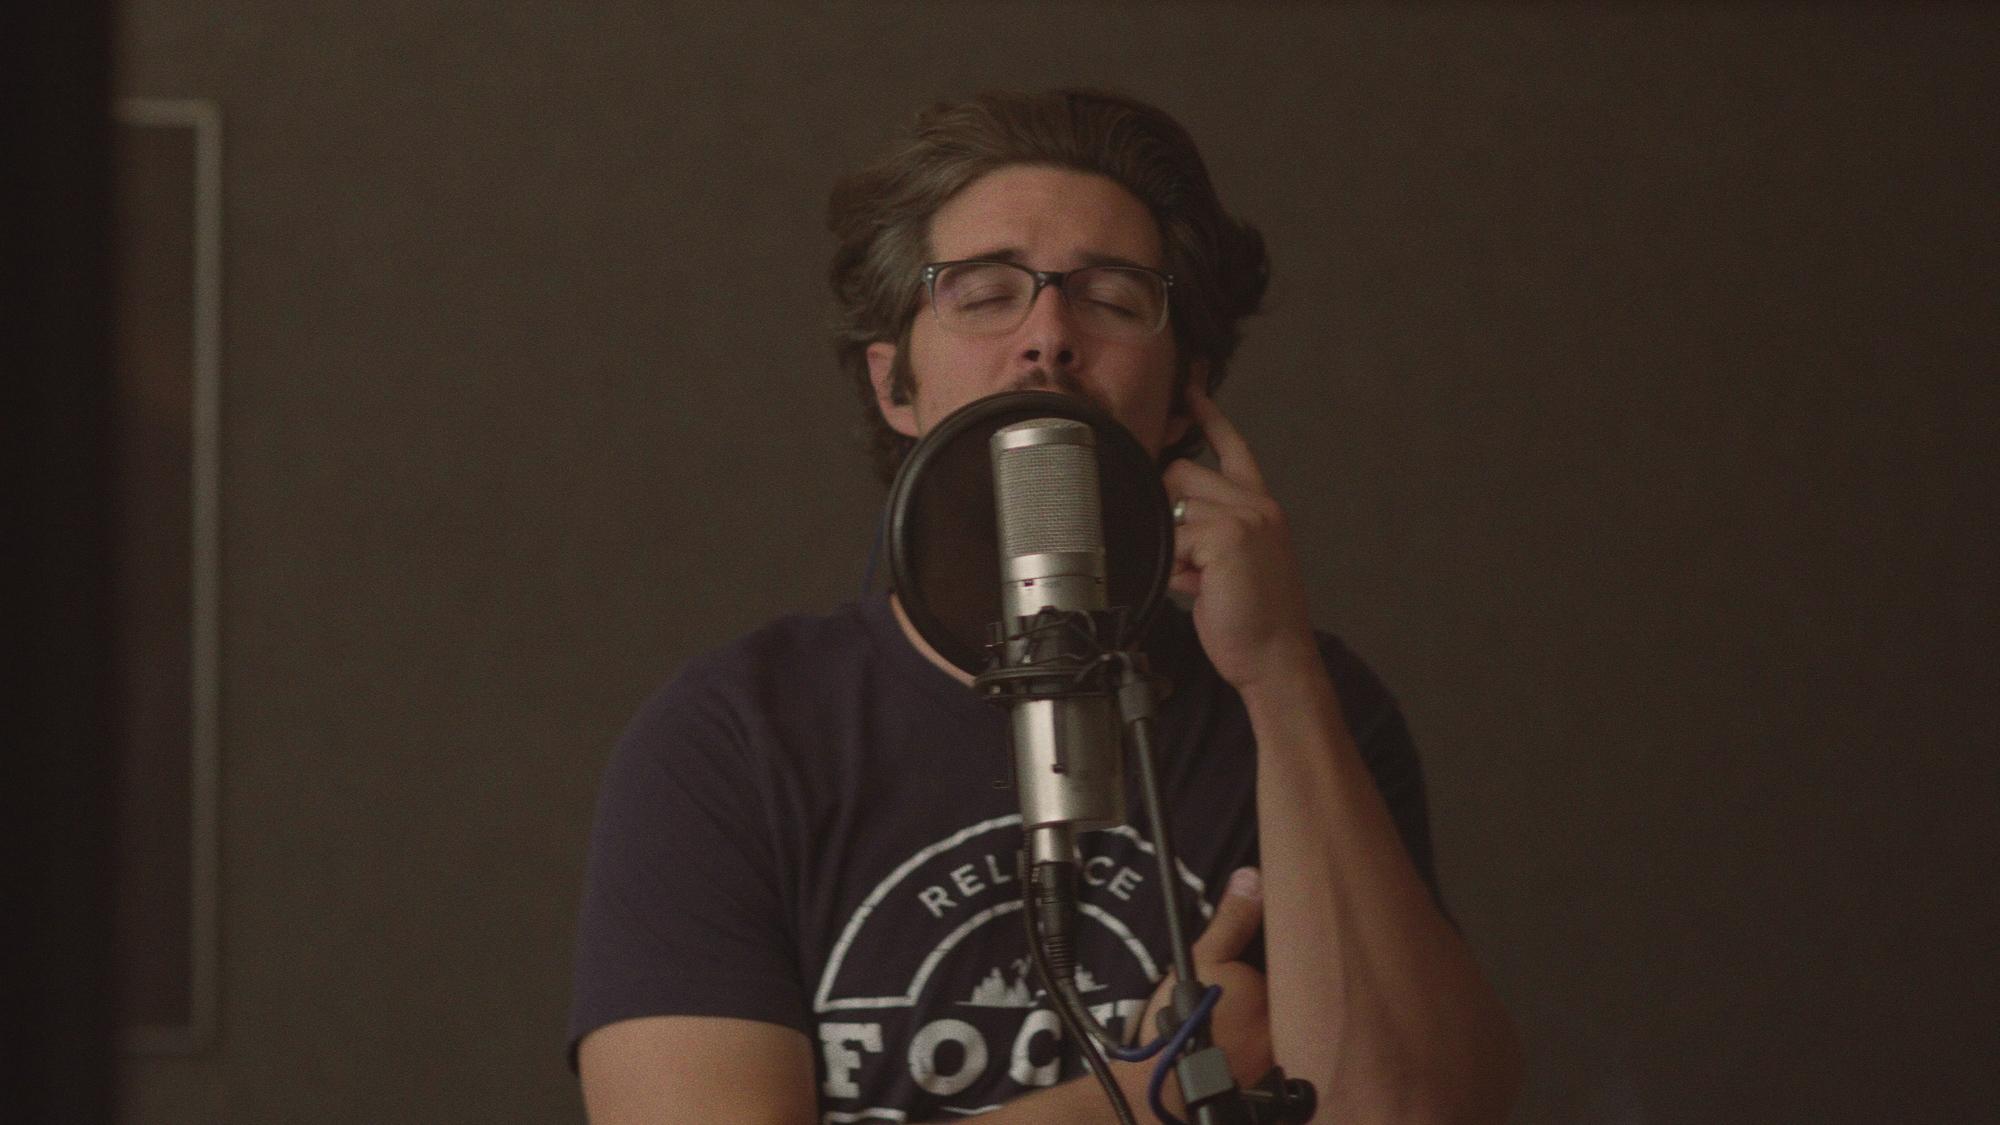 Vince_sing